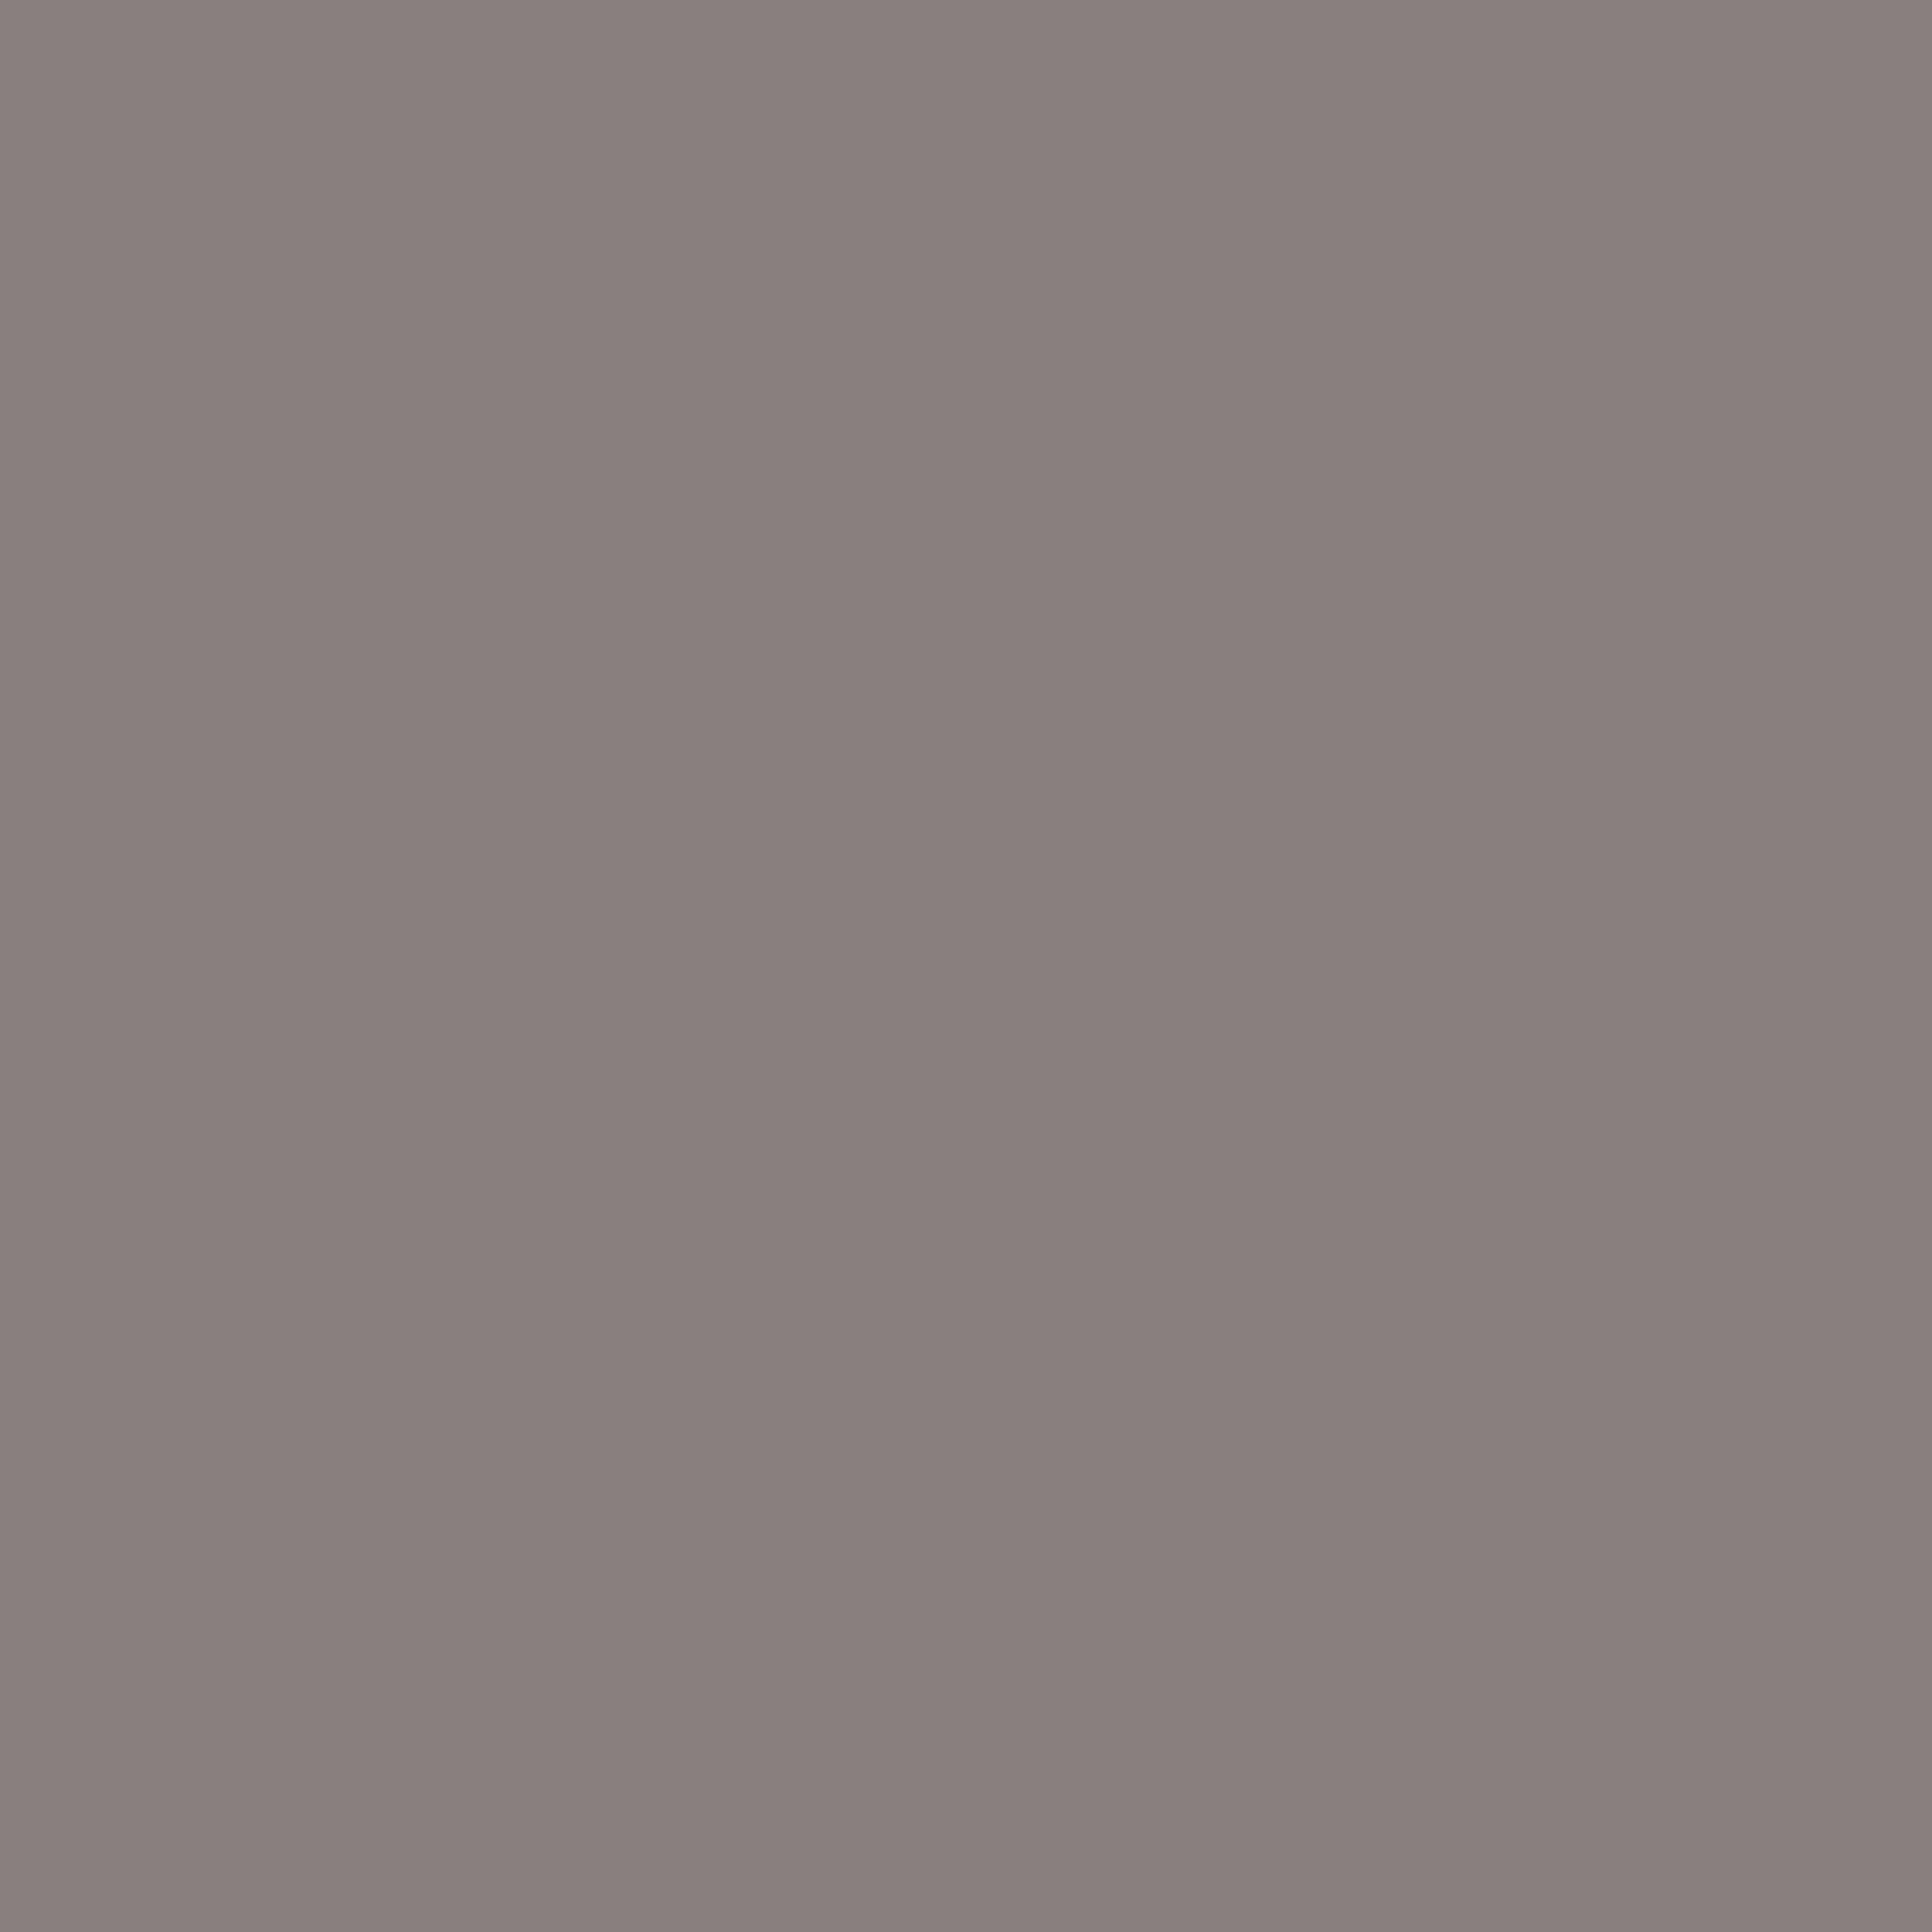 2048x2048 Rocket Metallic Solid Color Background